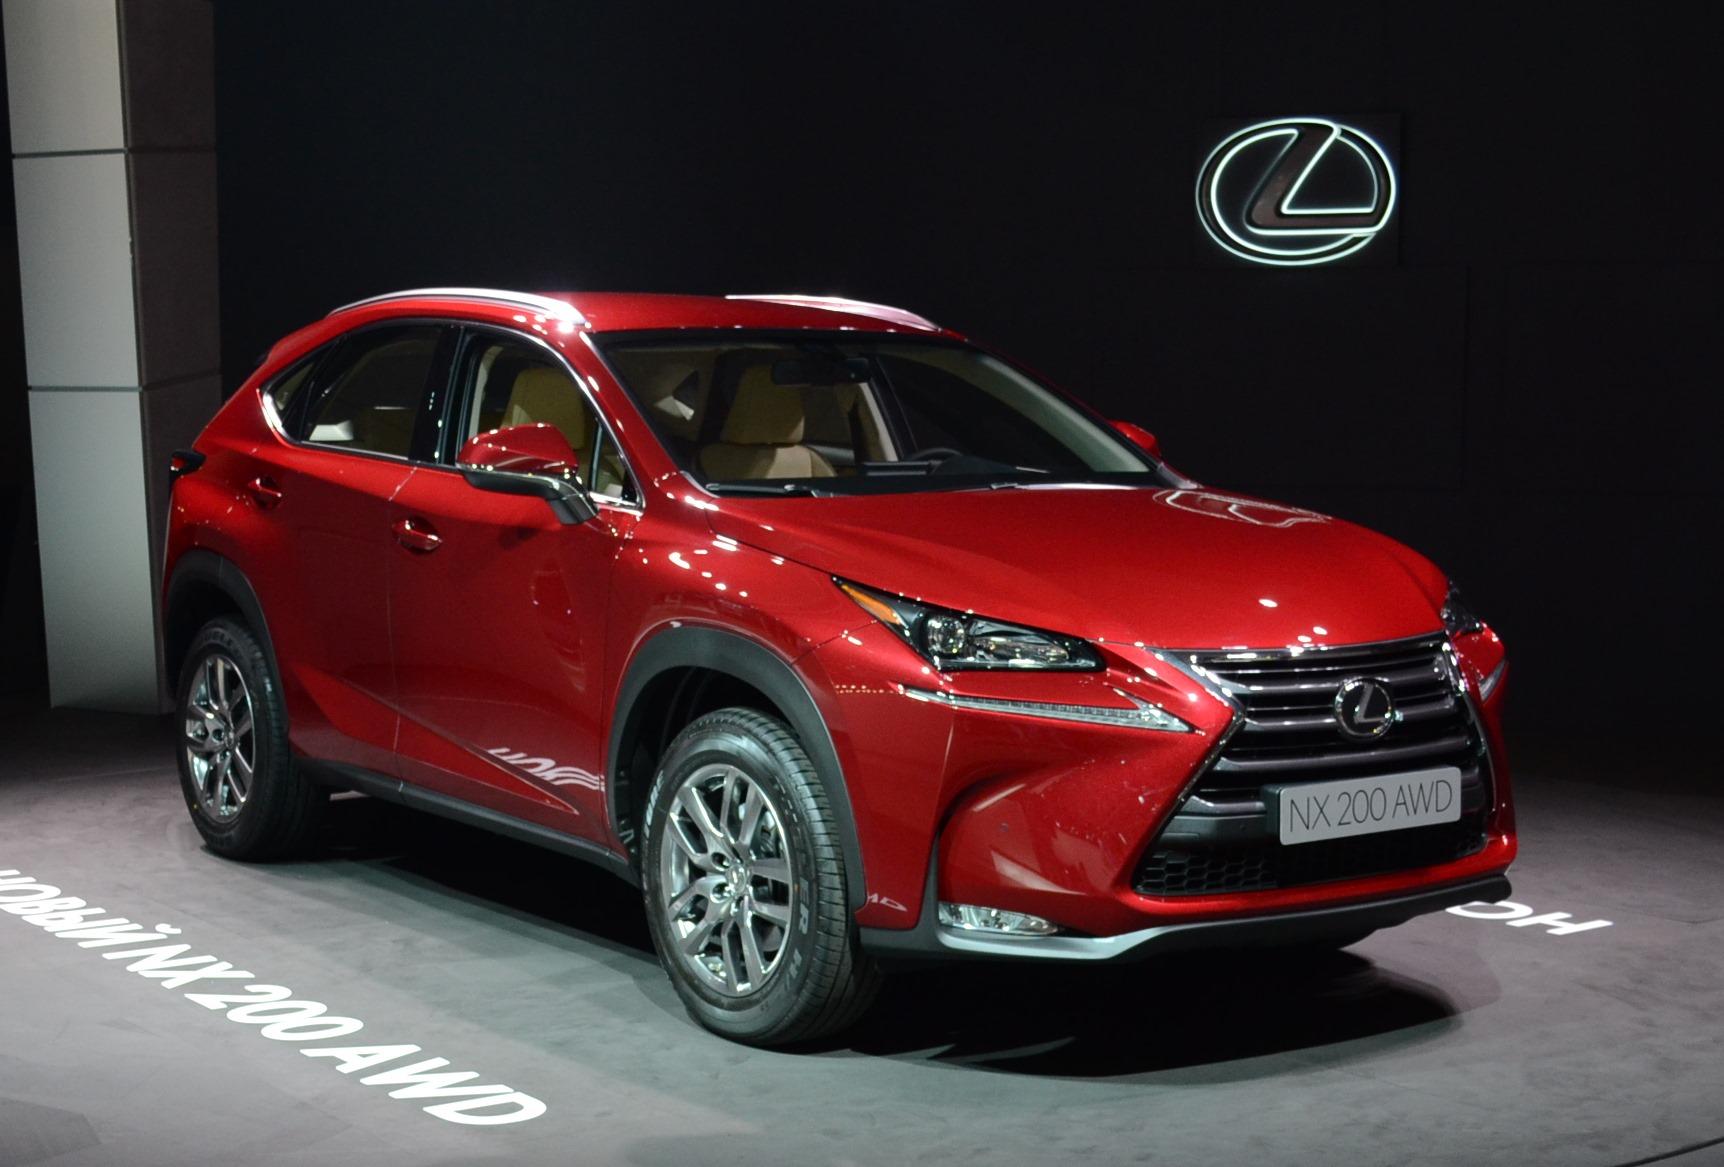 Lexus Hybrid Suv >> File:Lexus NX 200.JPG - Wikimedia Commons